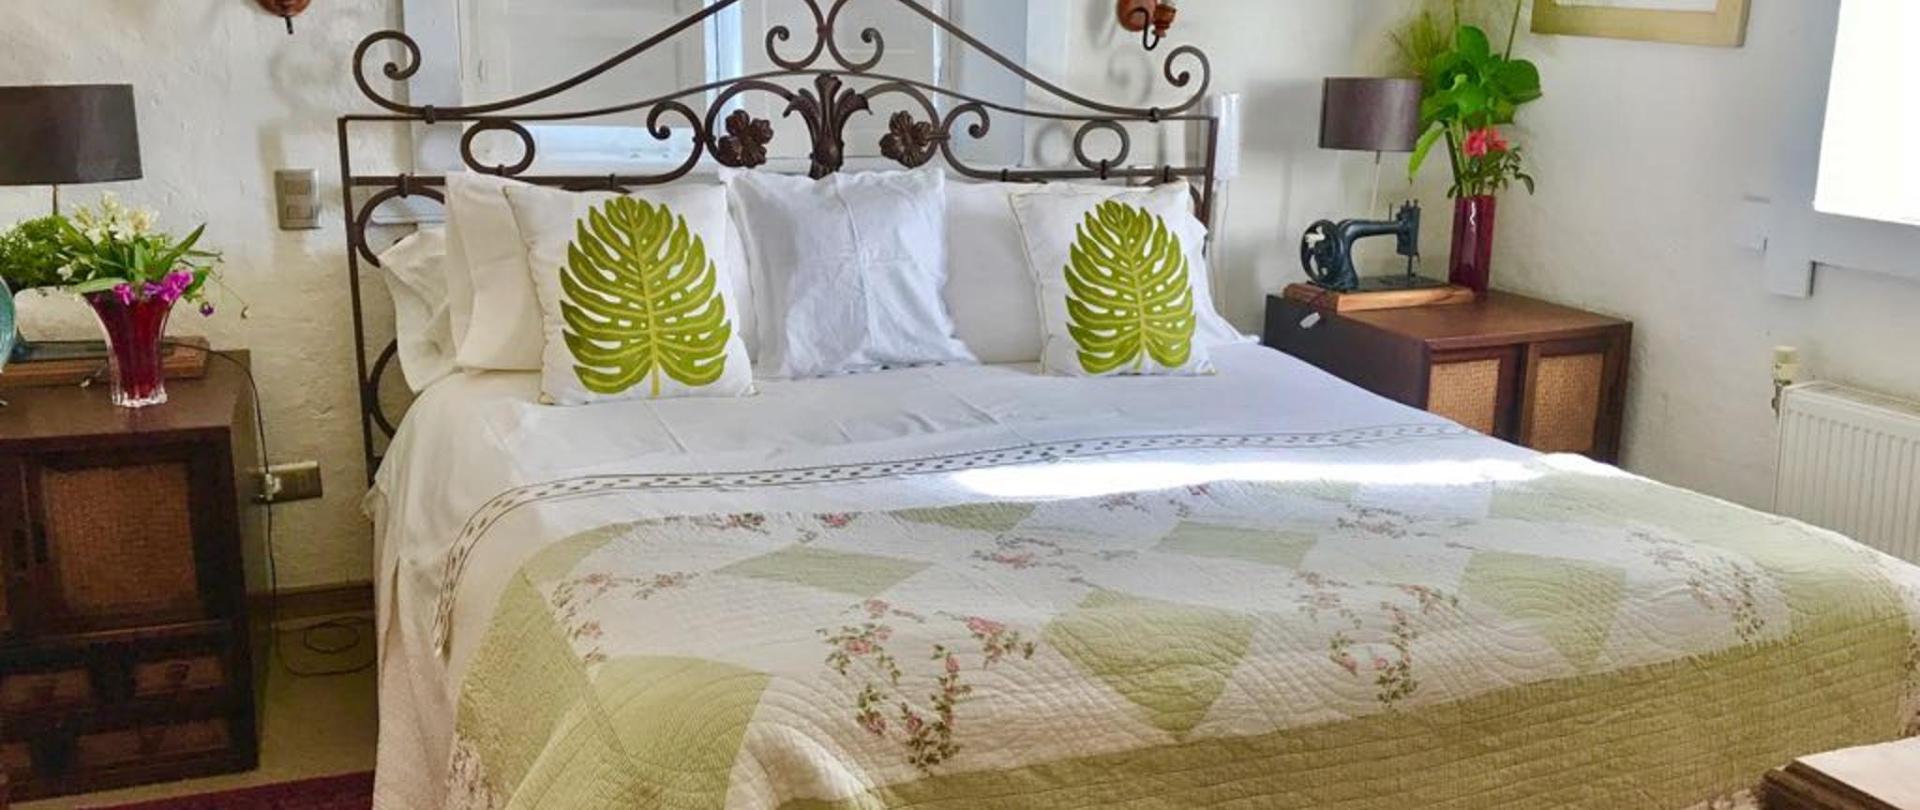 Hotel Vendimia Parador - Habitacion Matrimonial - Colchagua.JPG